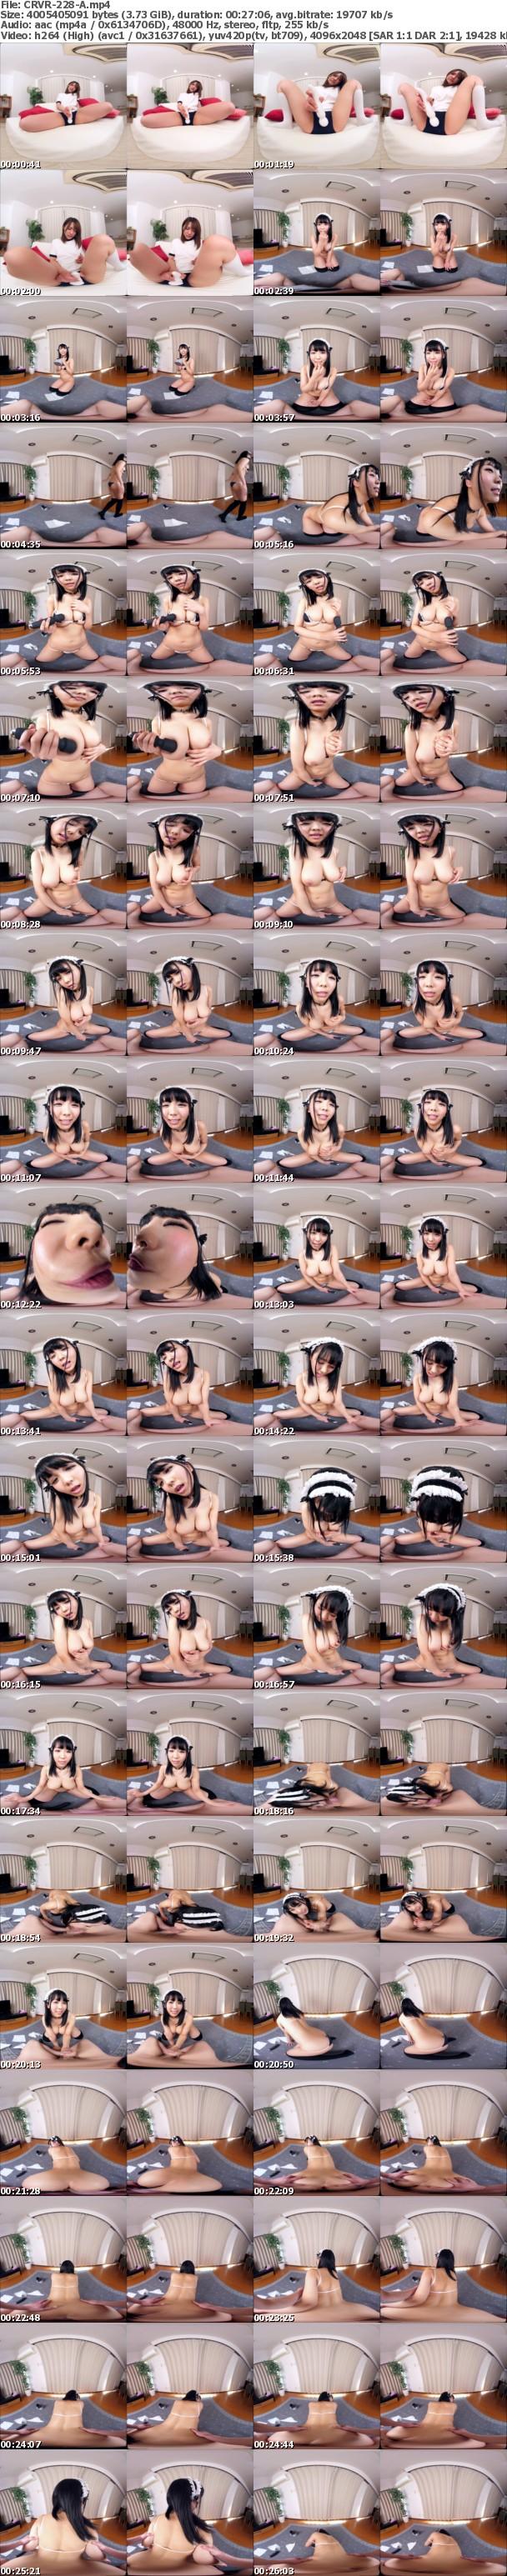 (VR) CRVR-228 稲場るか 巨乳見せつけ&顔ガン見オナニーに感激&谷間見せつけプレイに大満足!ボクのことを好き過ぎるご奉仕メイドとのなんともうらやましい日常。